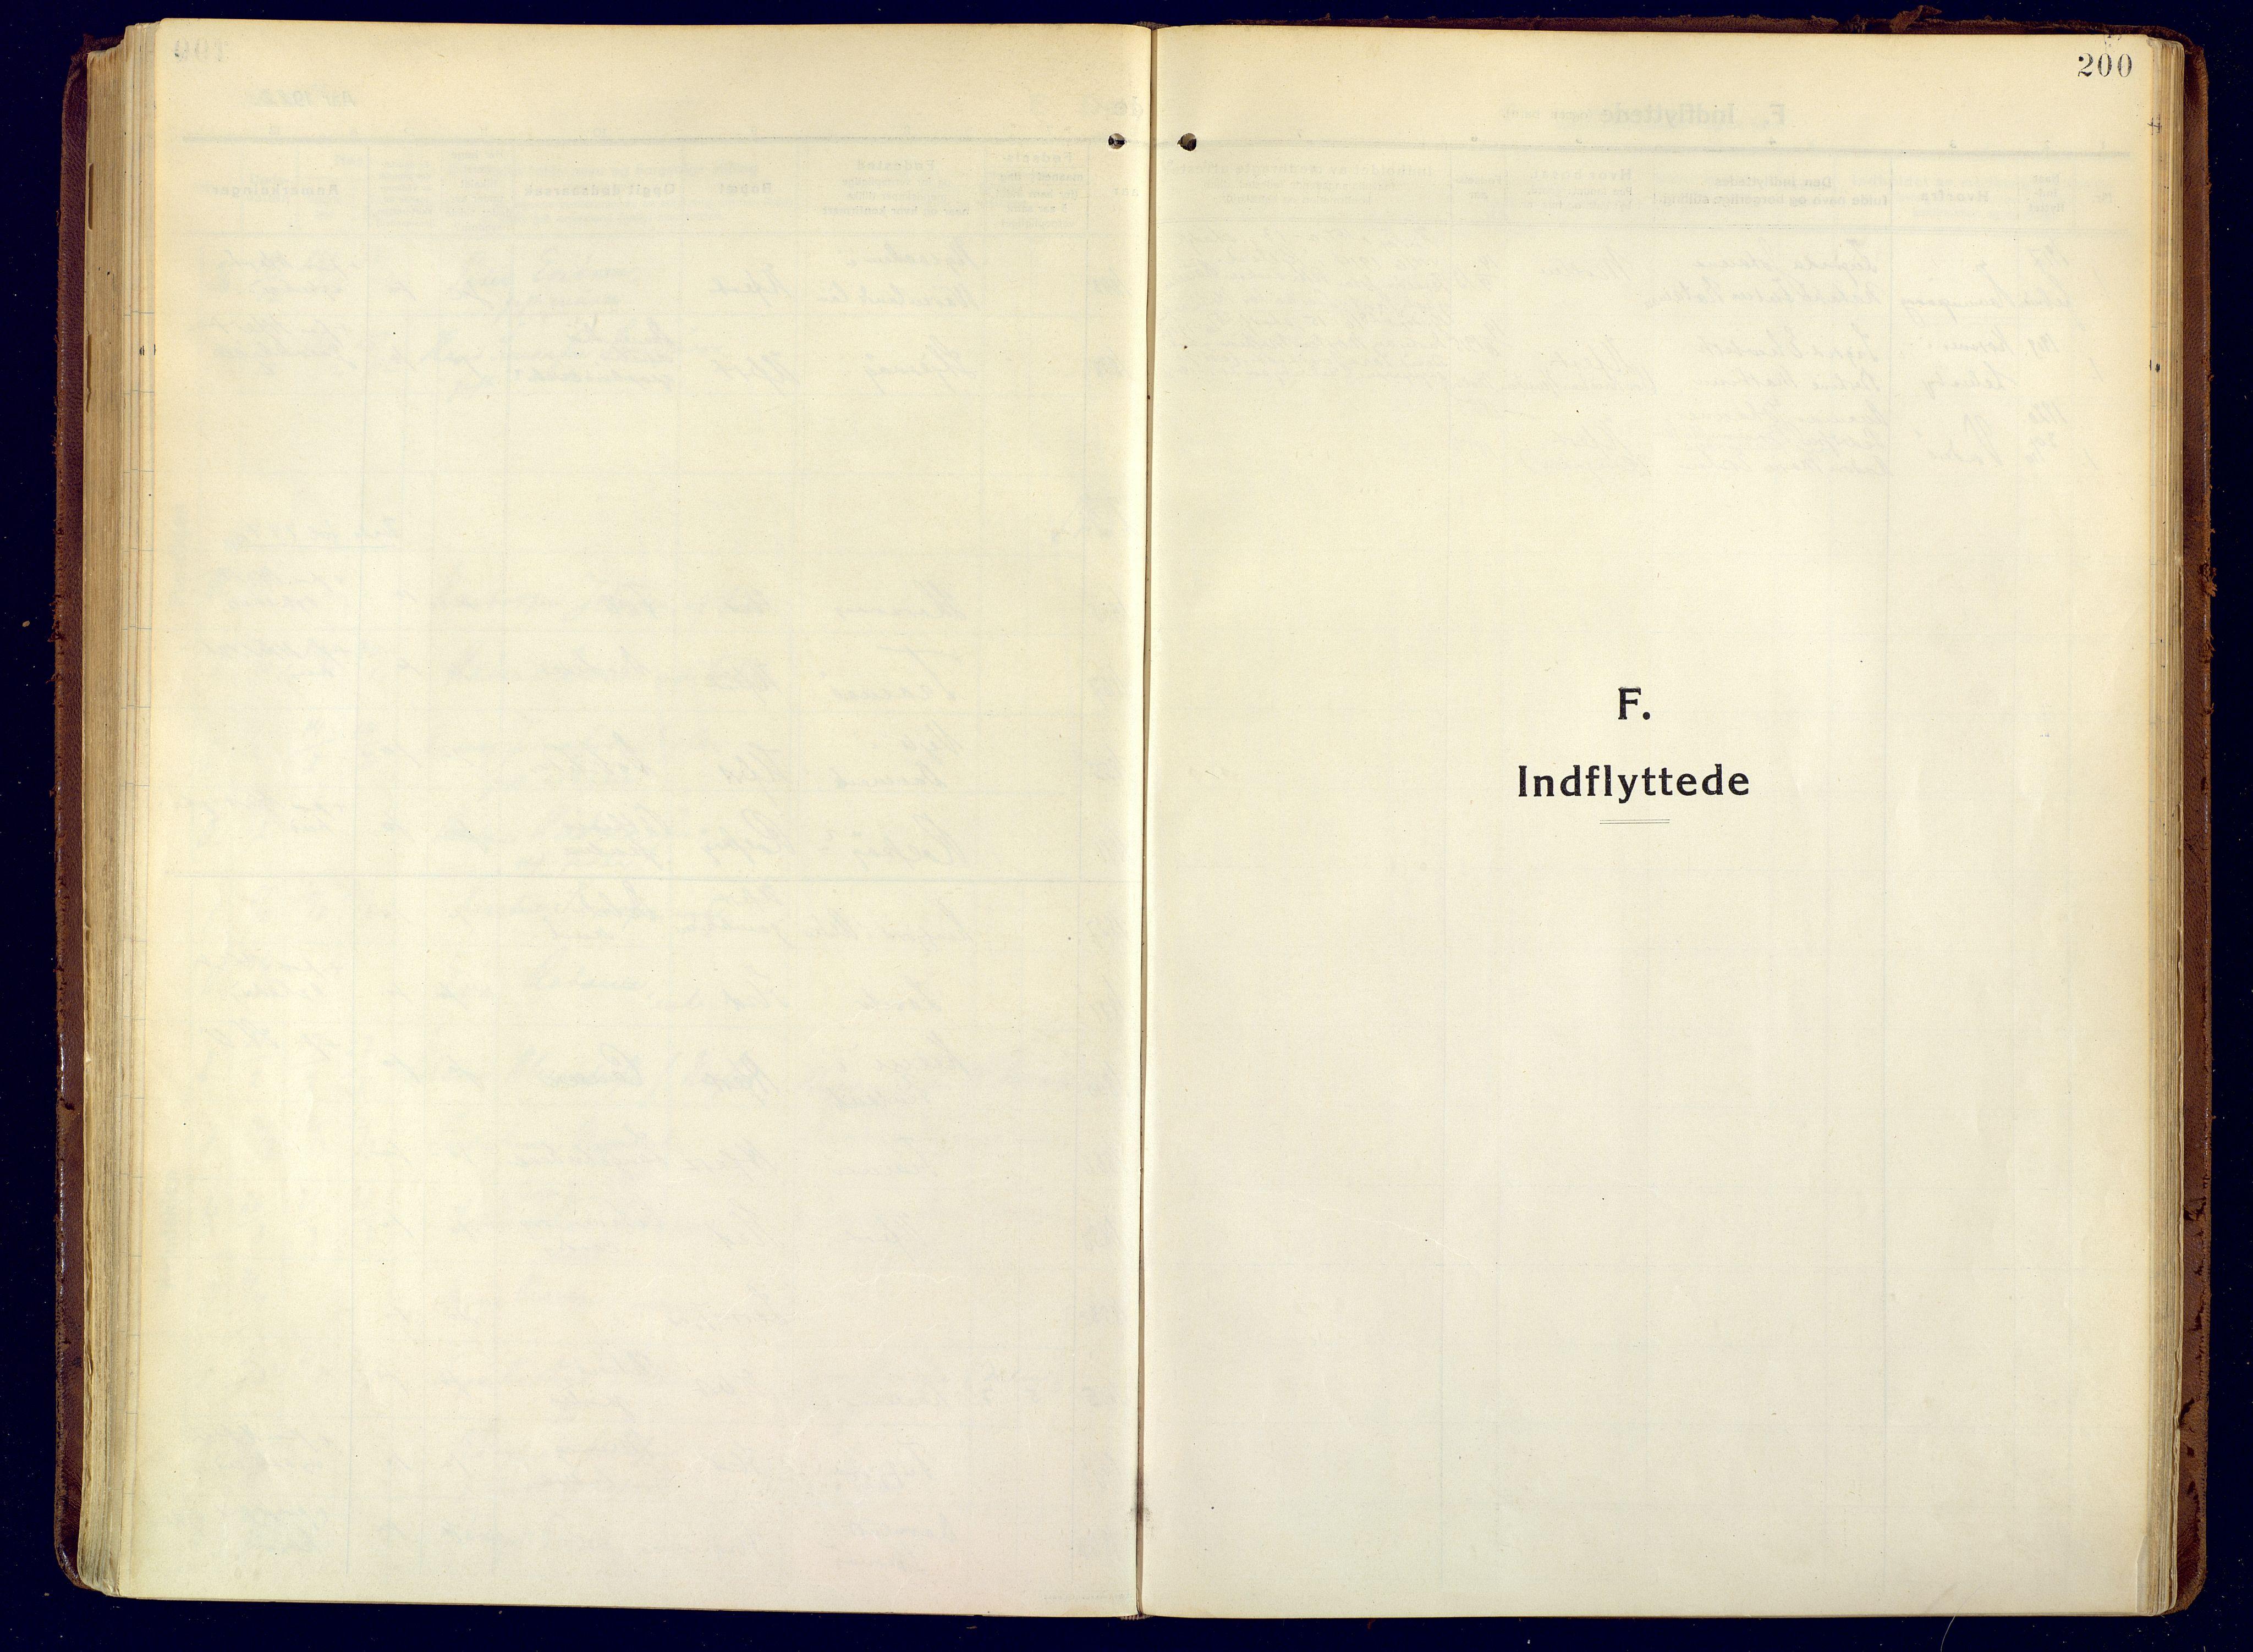 SATØ, Hammerfest sokneprestembete, Ministerialbok nr. 15, 1916-1923, s. 200